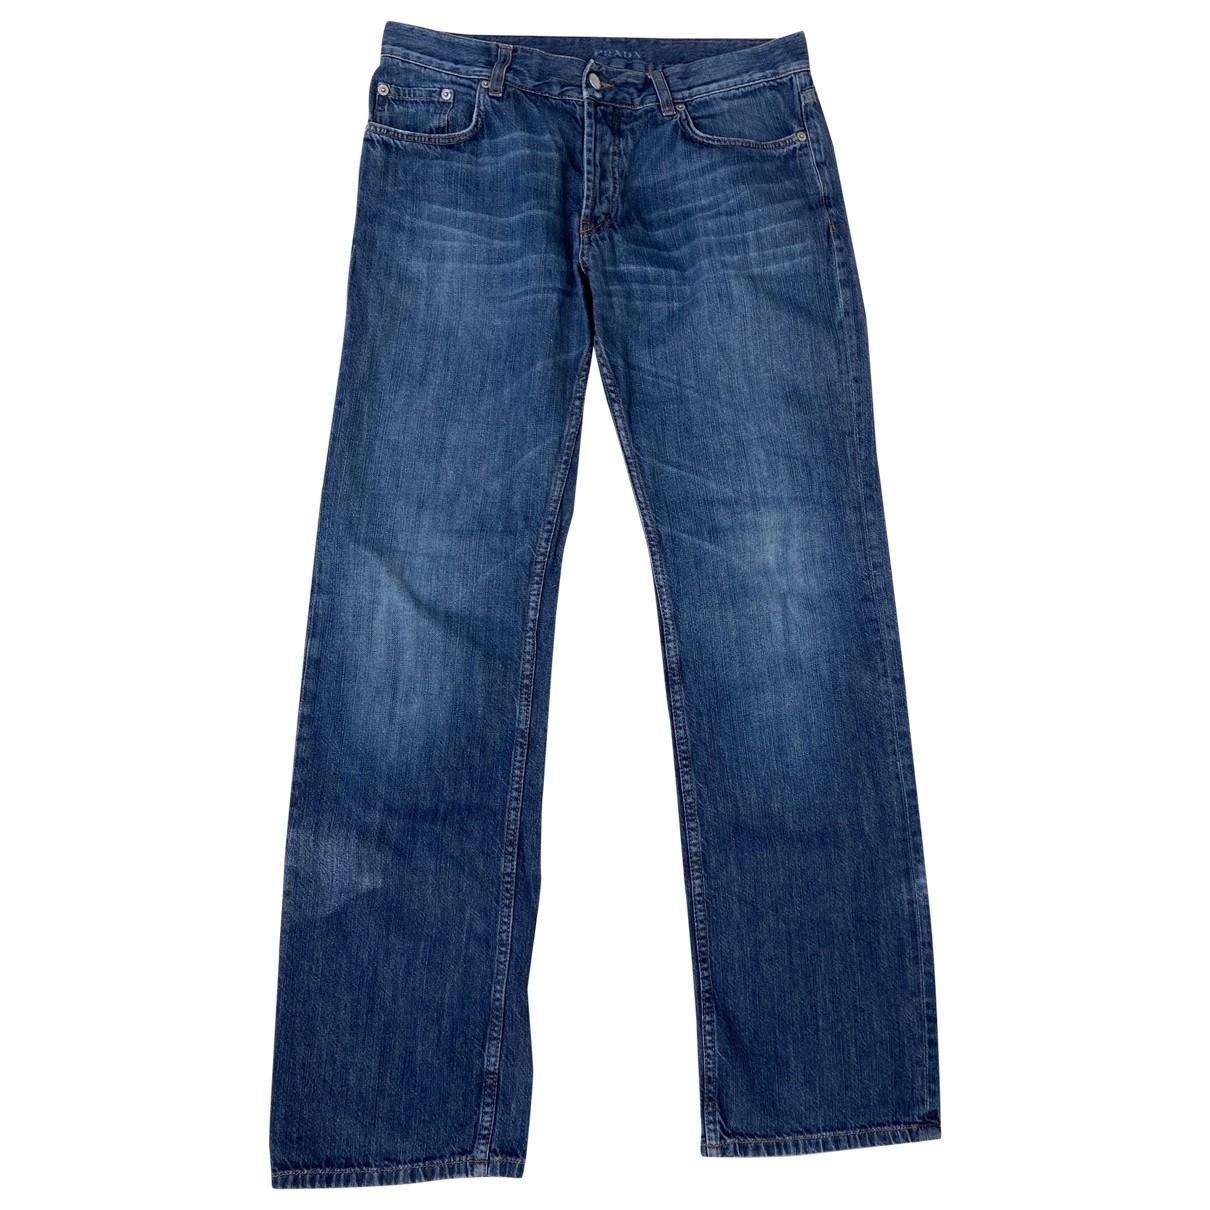 Prada \N Blue Cotton Jeans for Men 34 US